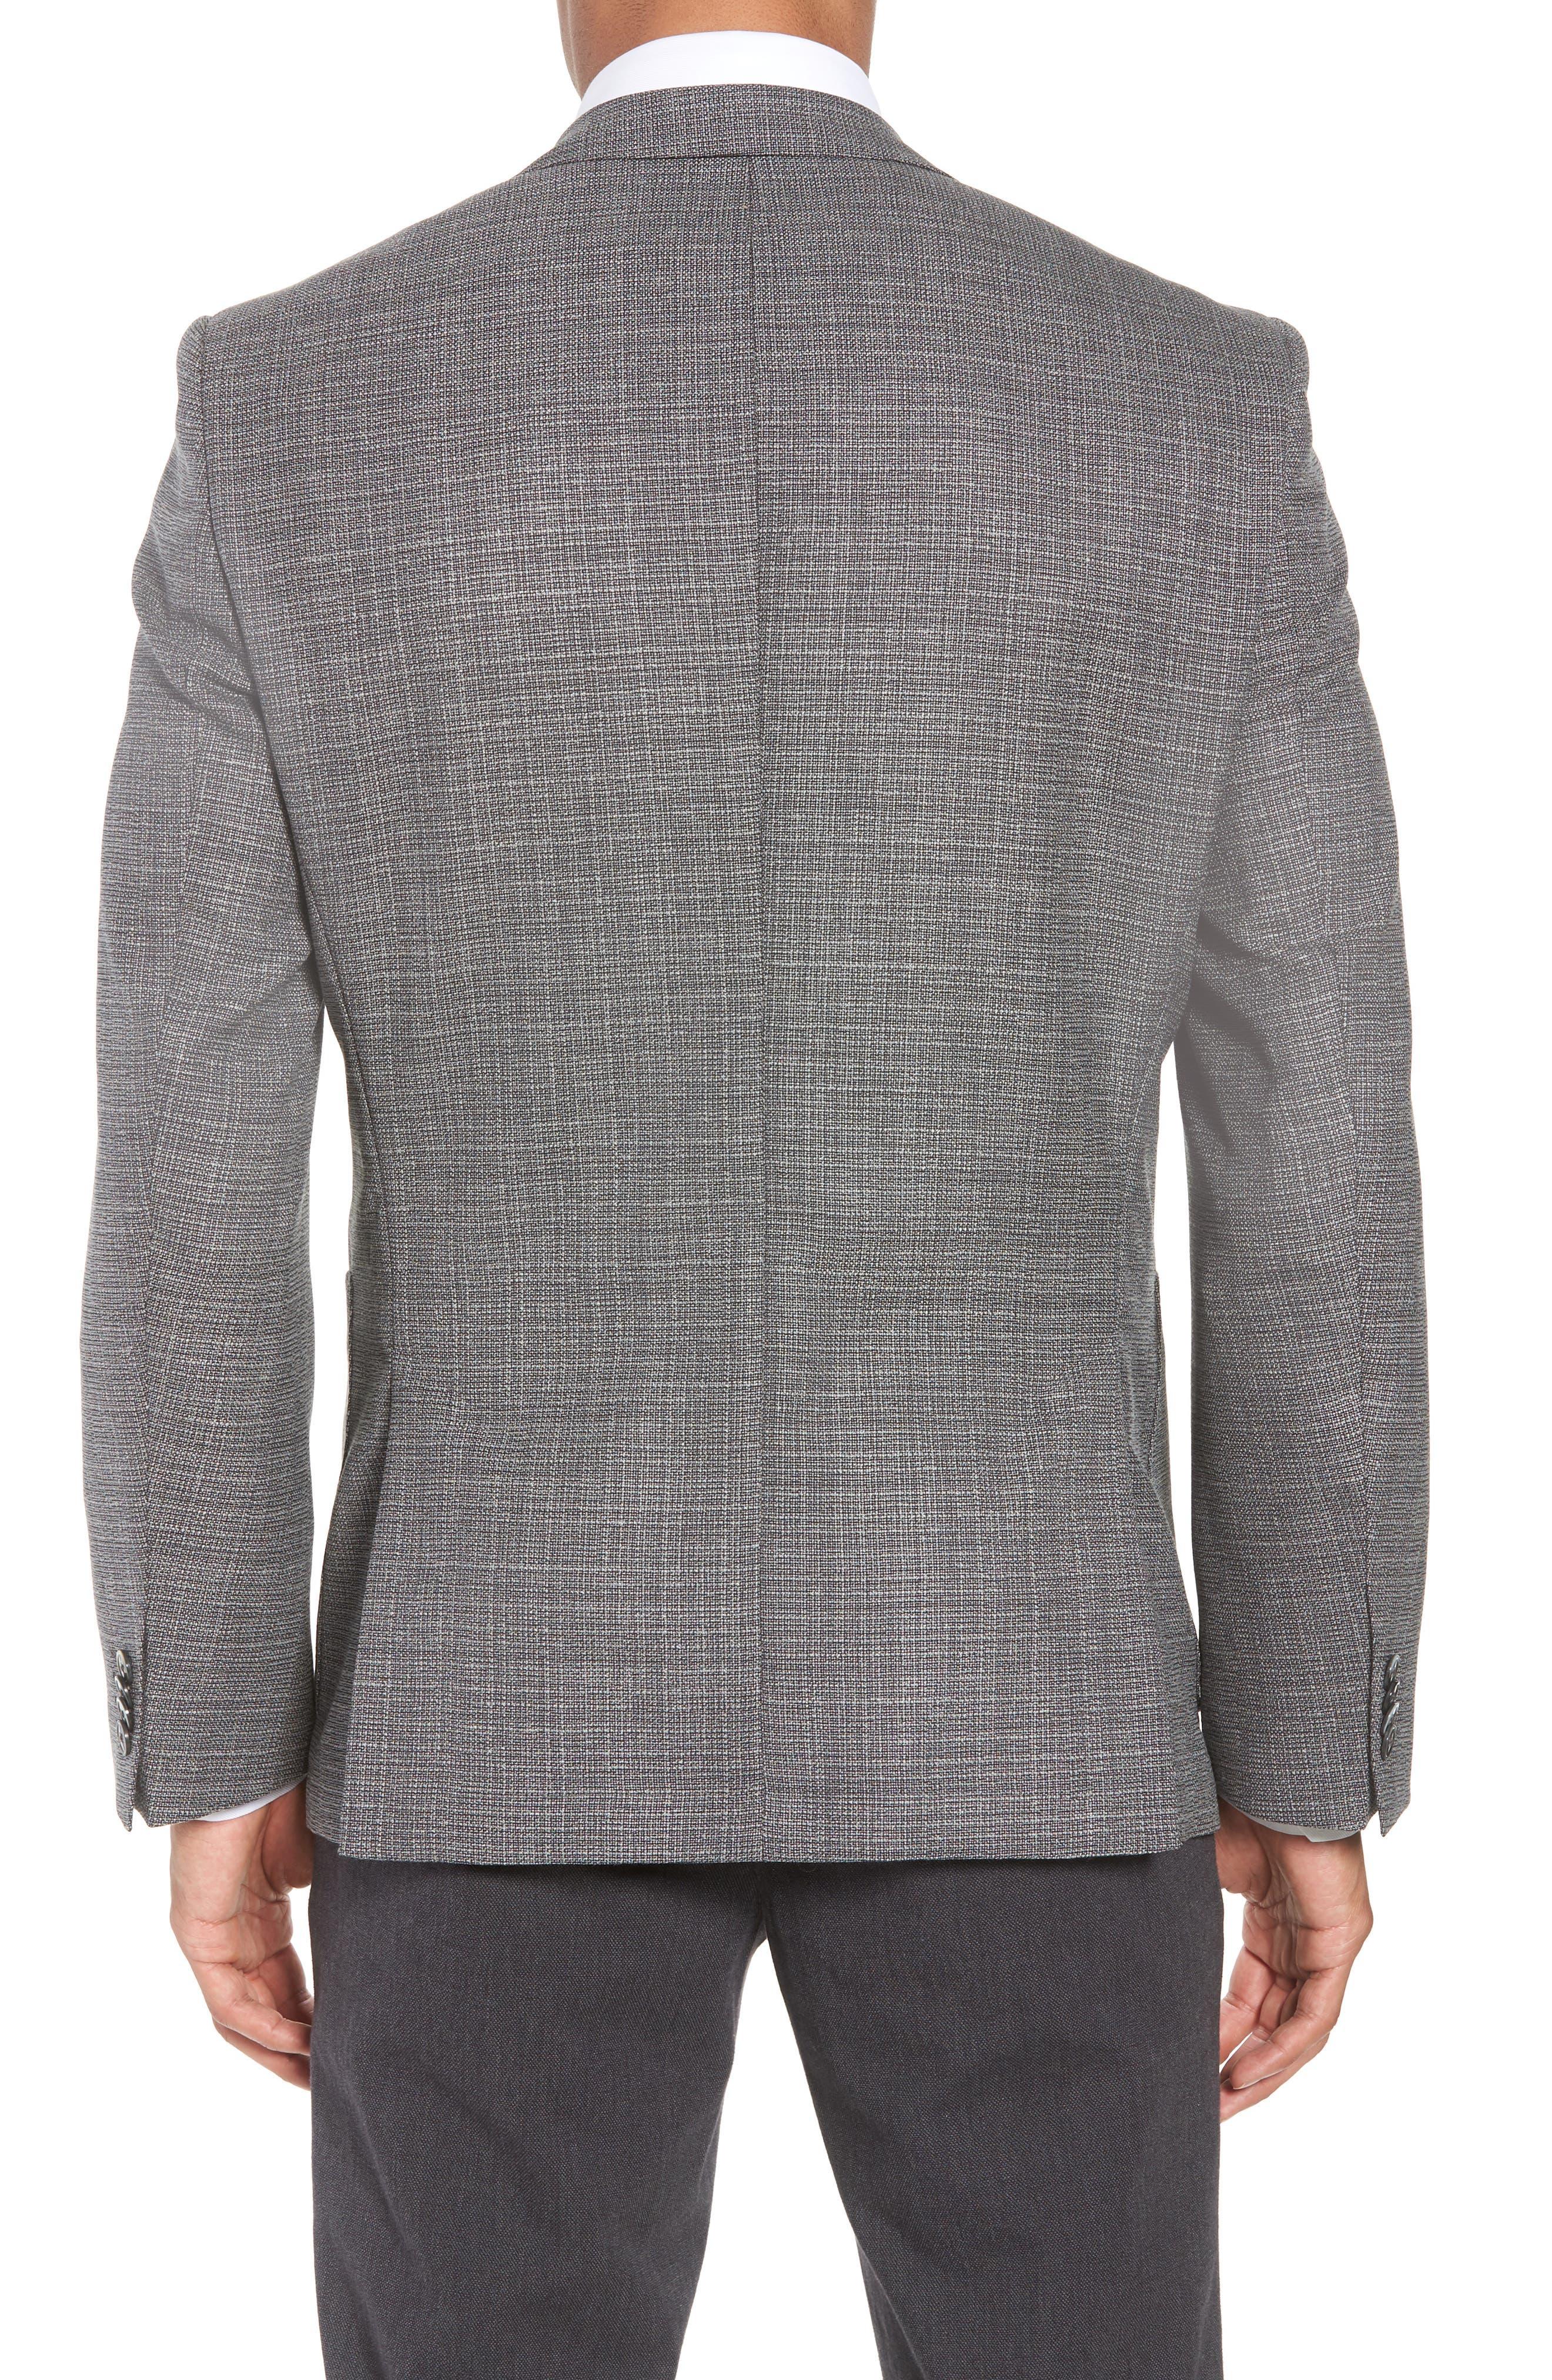 BOSS, Janson Classic Fit Wool Blazer, Alternate thumbnail 2, color, GREY